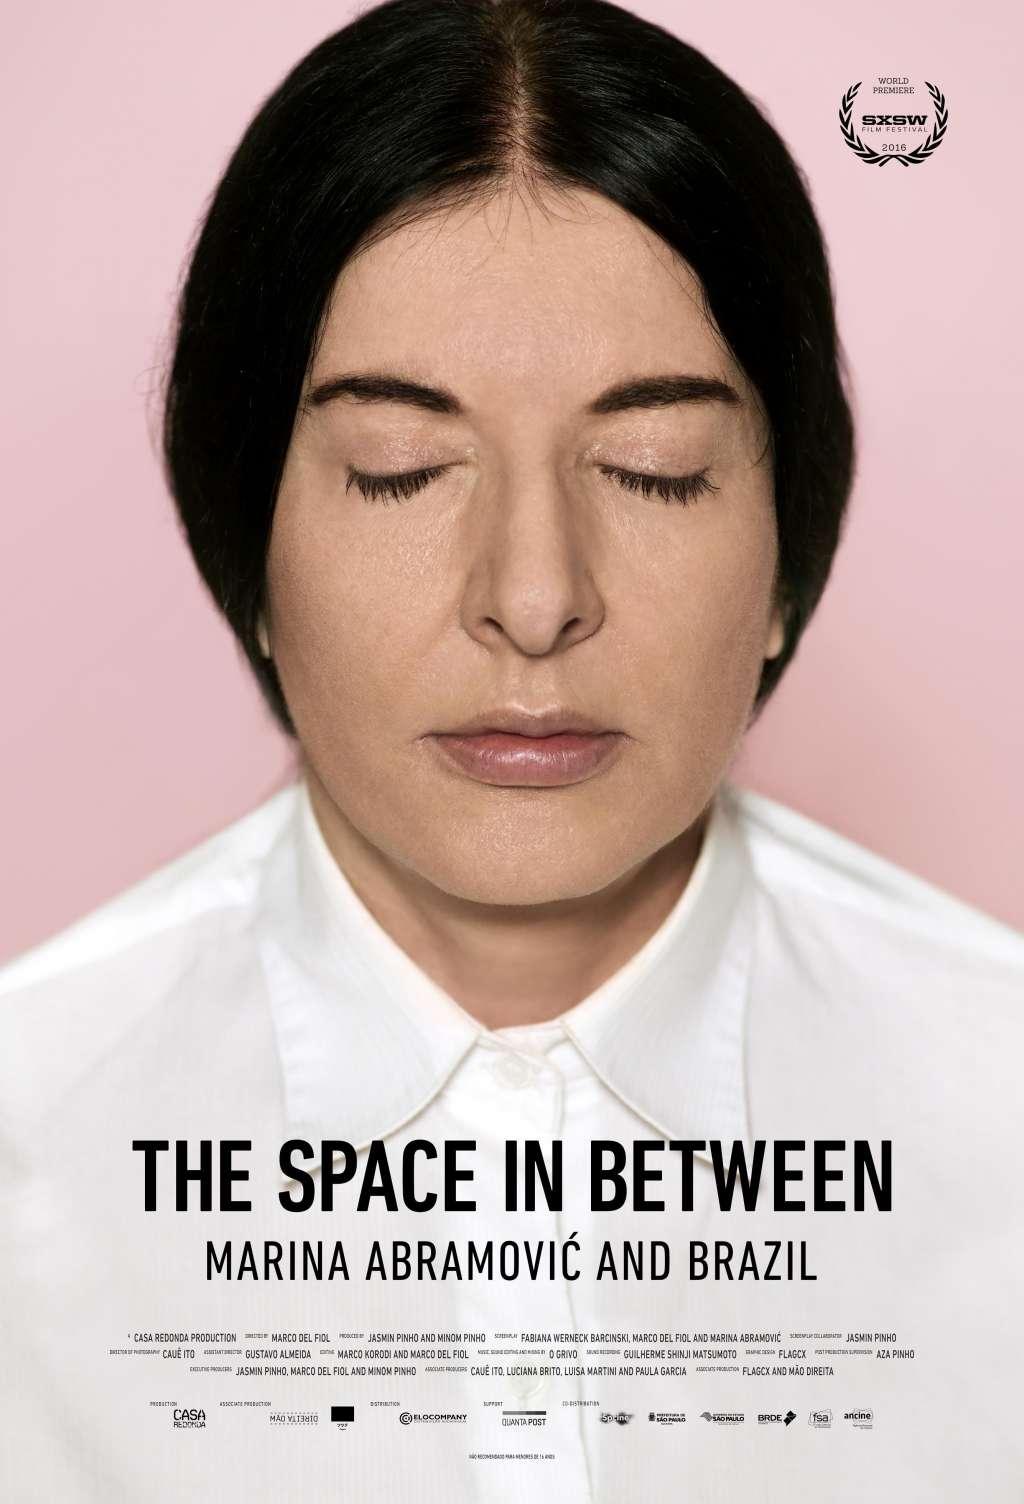 Marina Abramovic In Brazil: The Space In Between kapak